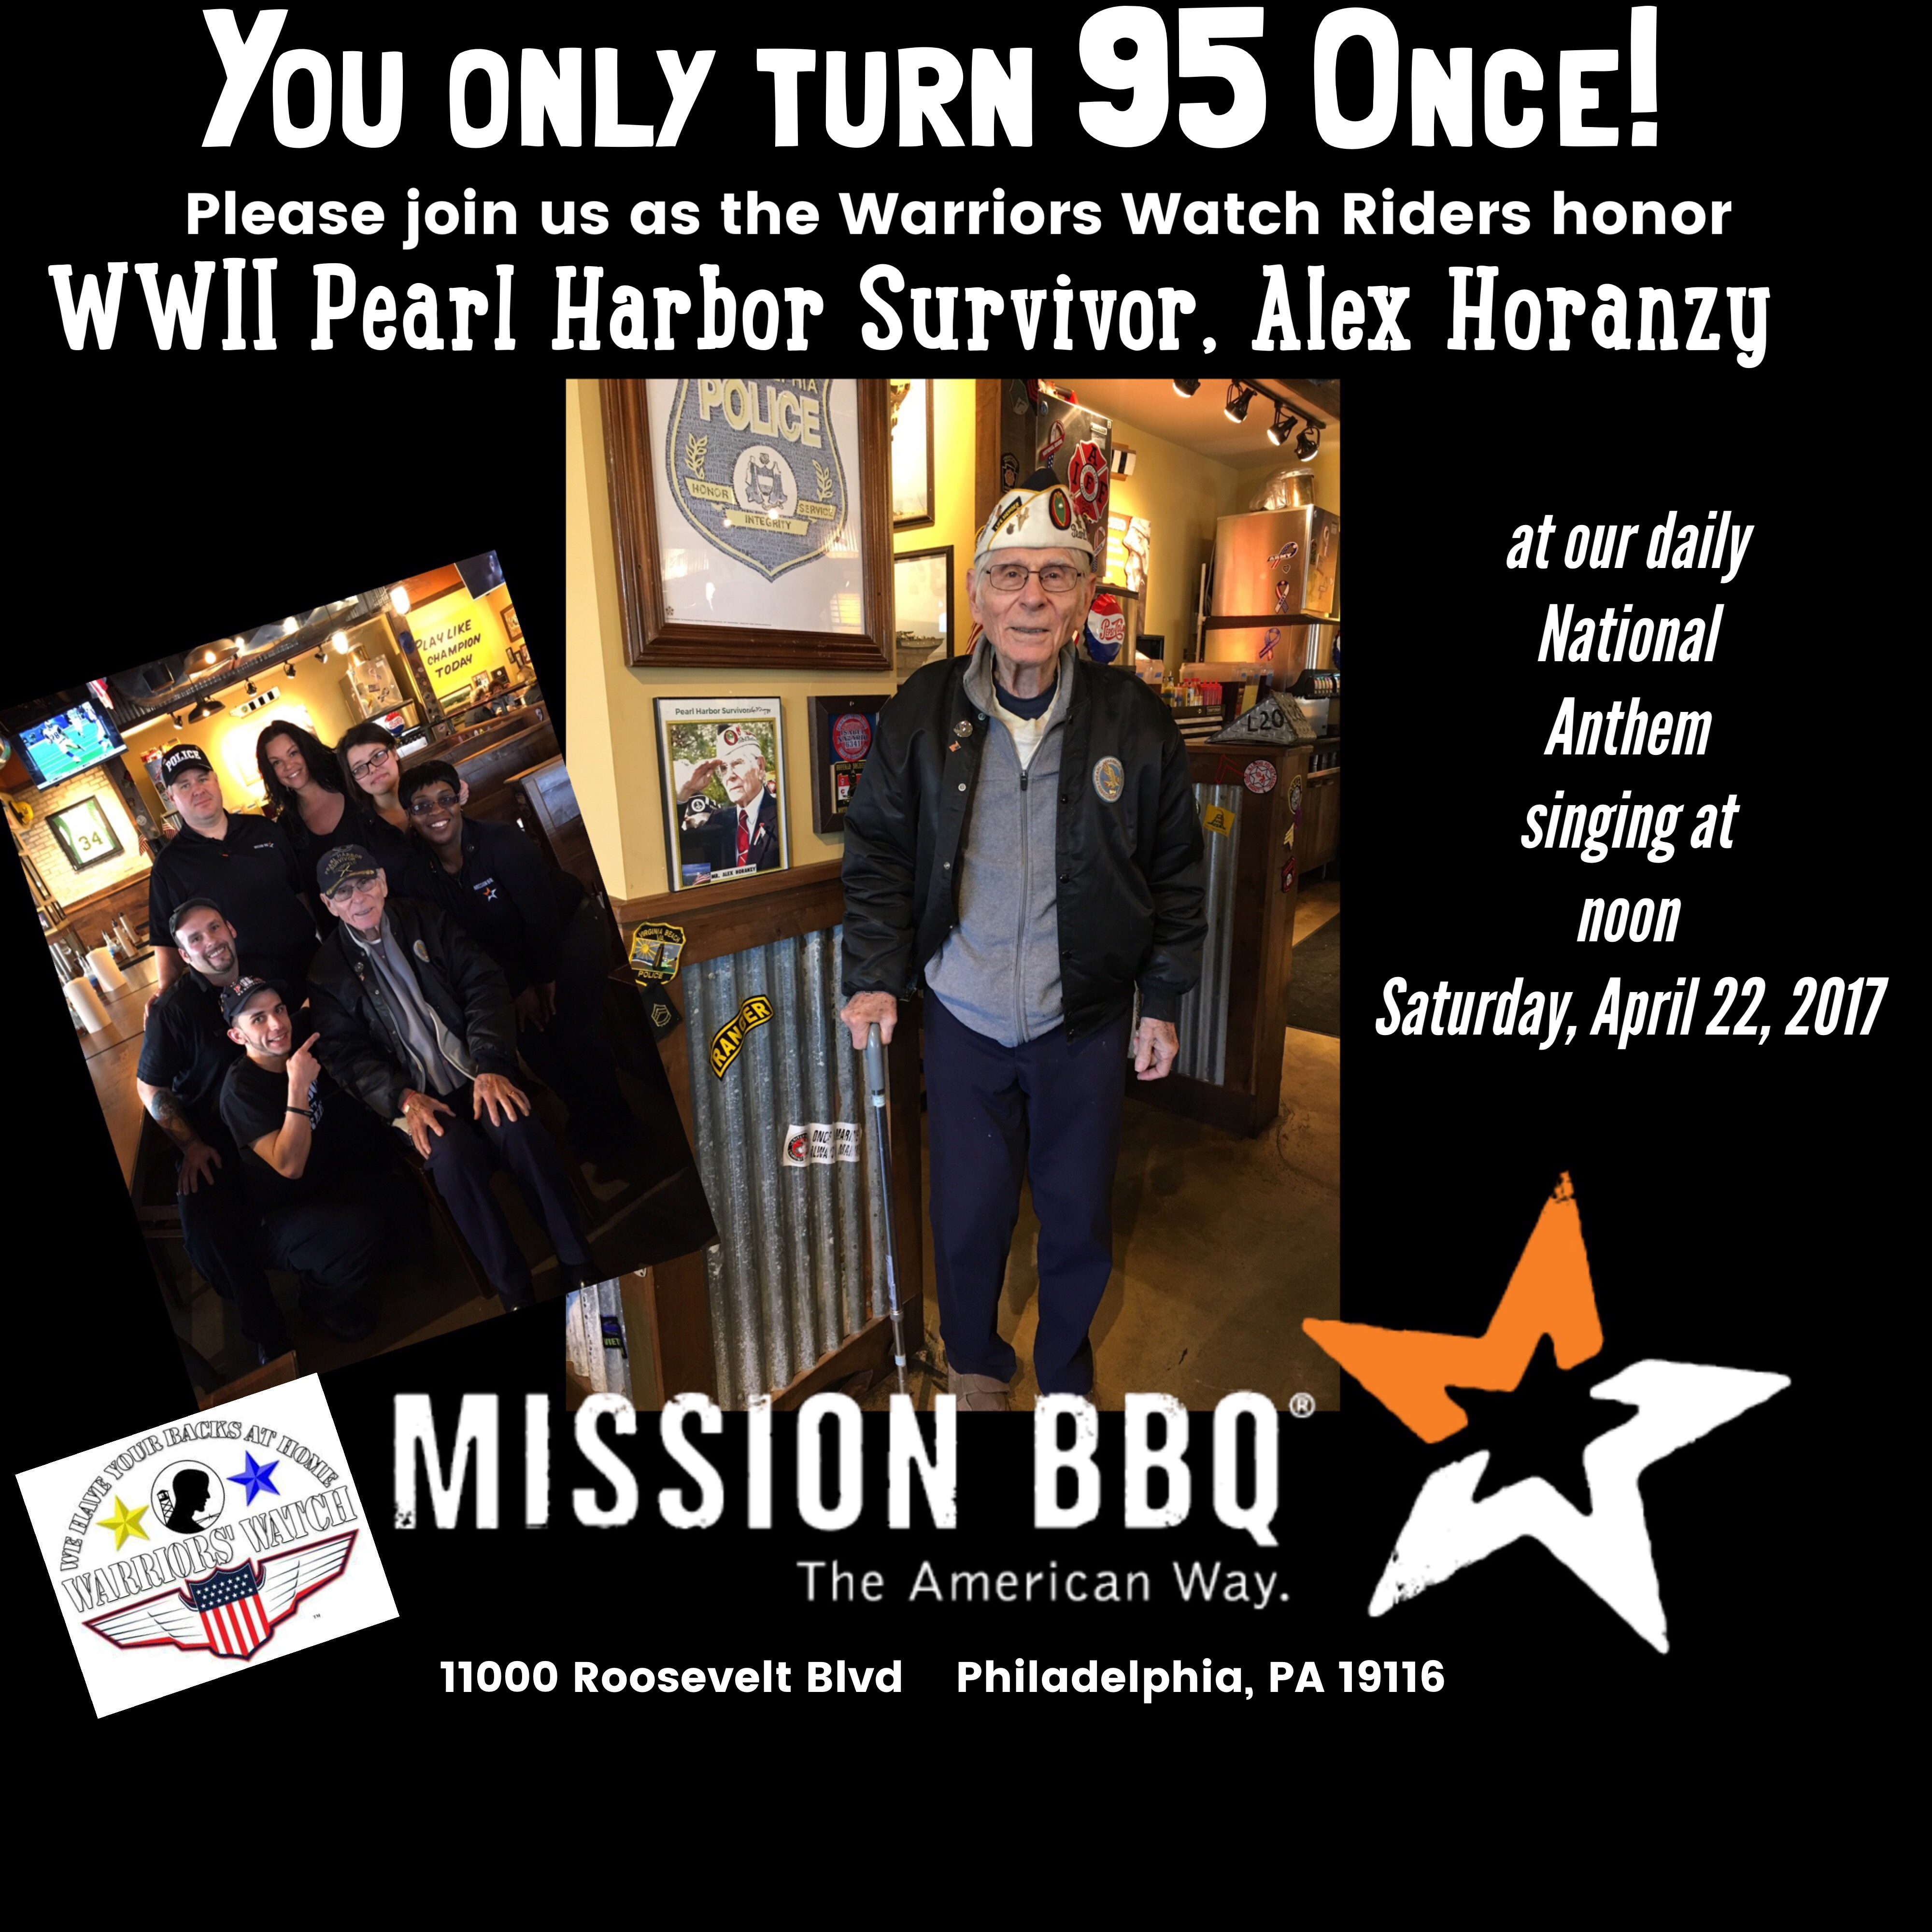 Pearl Harbor Survivor, Alex Horanzy's 95th Birthday honored at MISSION BBQ Philadelphia